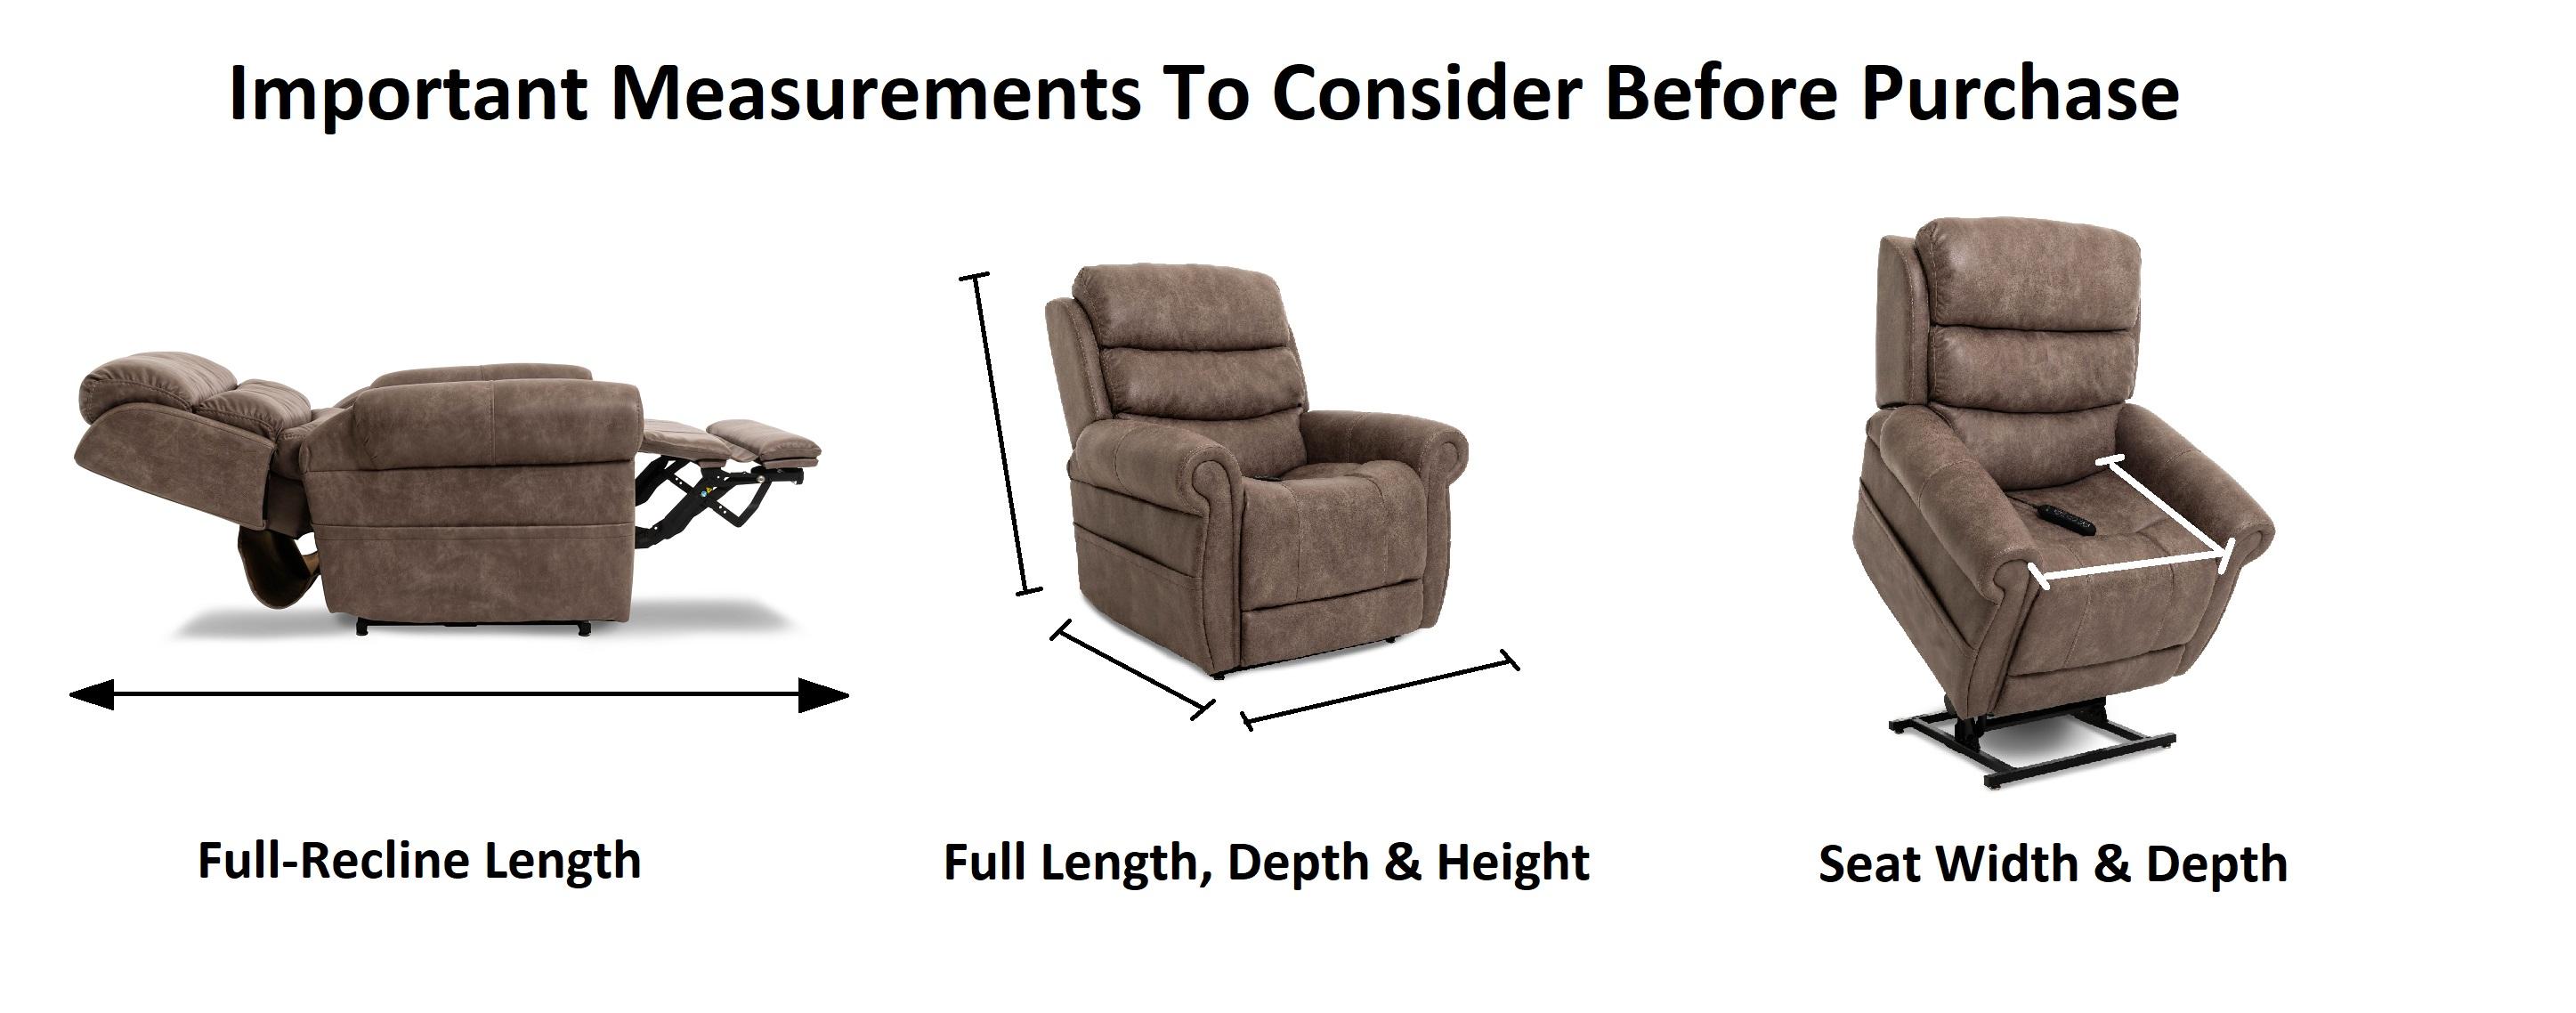 medical recliner size dimensions